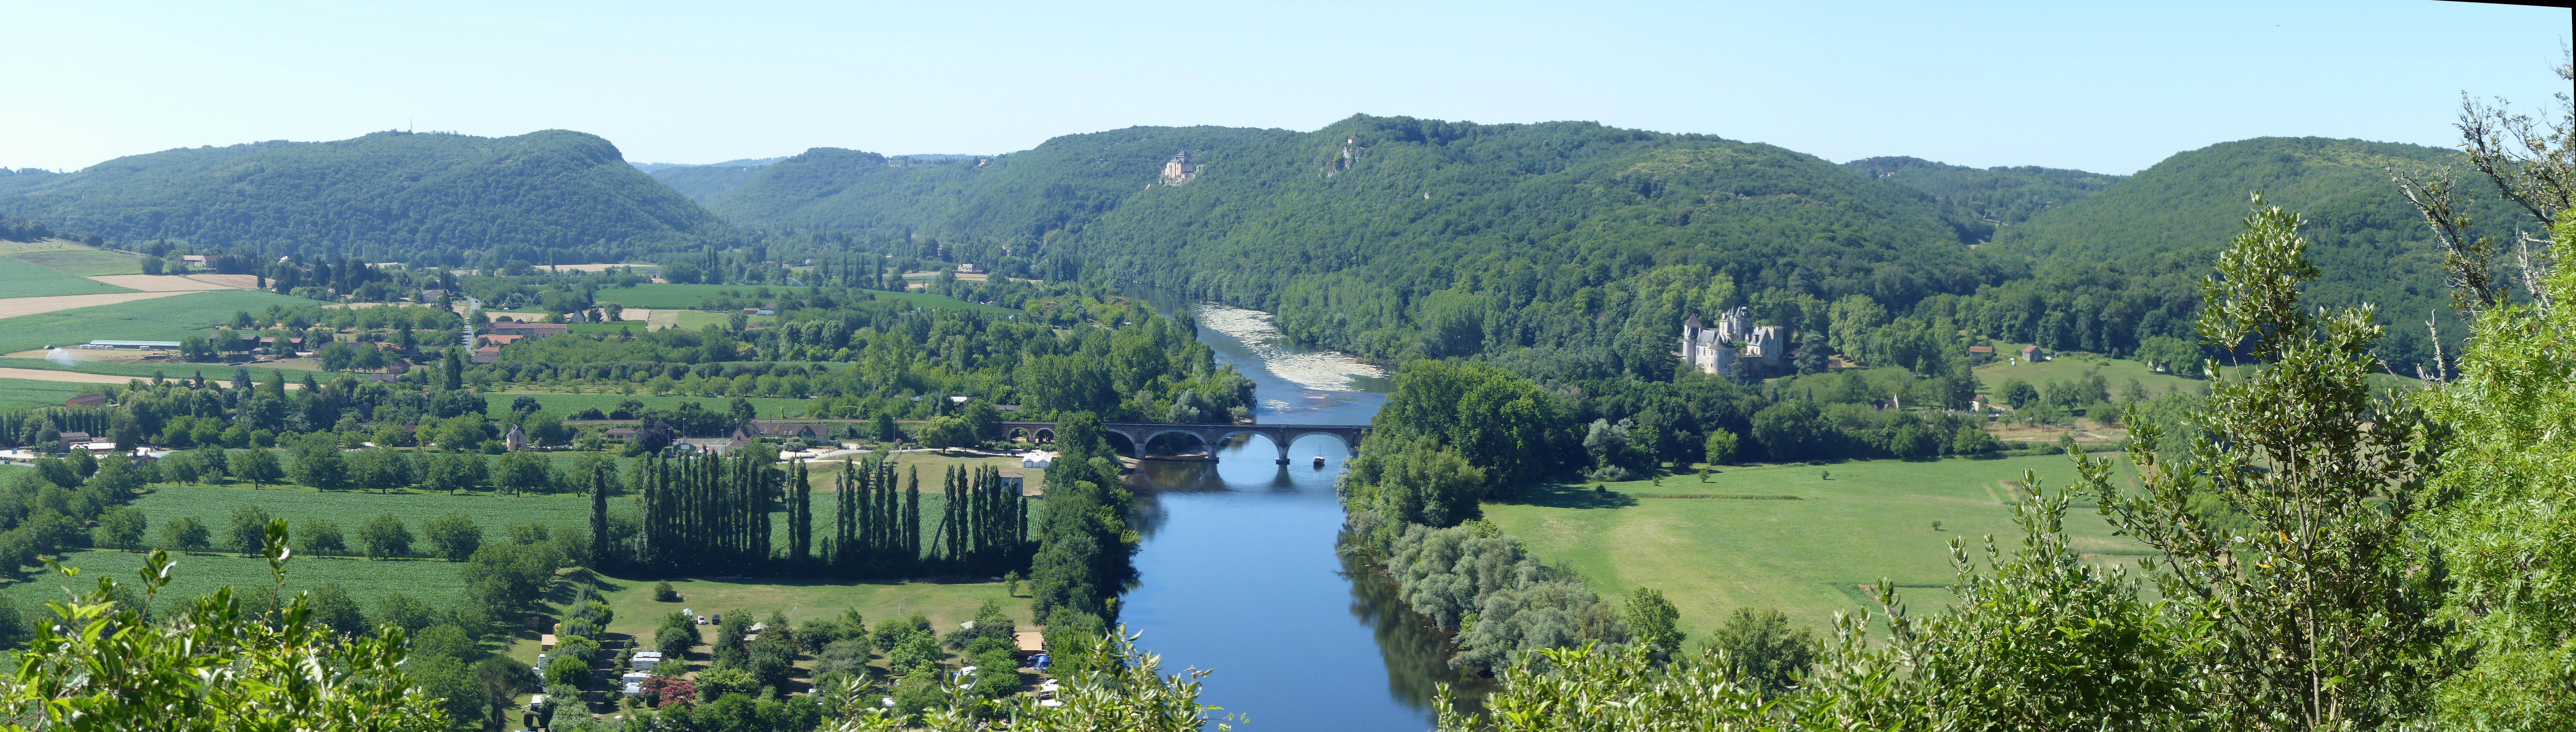 Vallée de la Dordogne - SOE Conseil